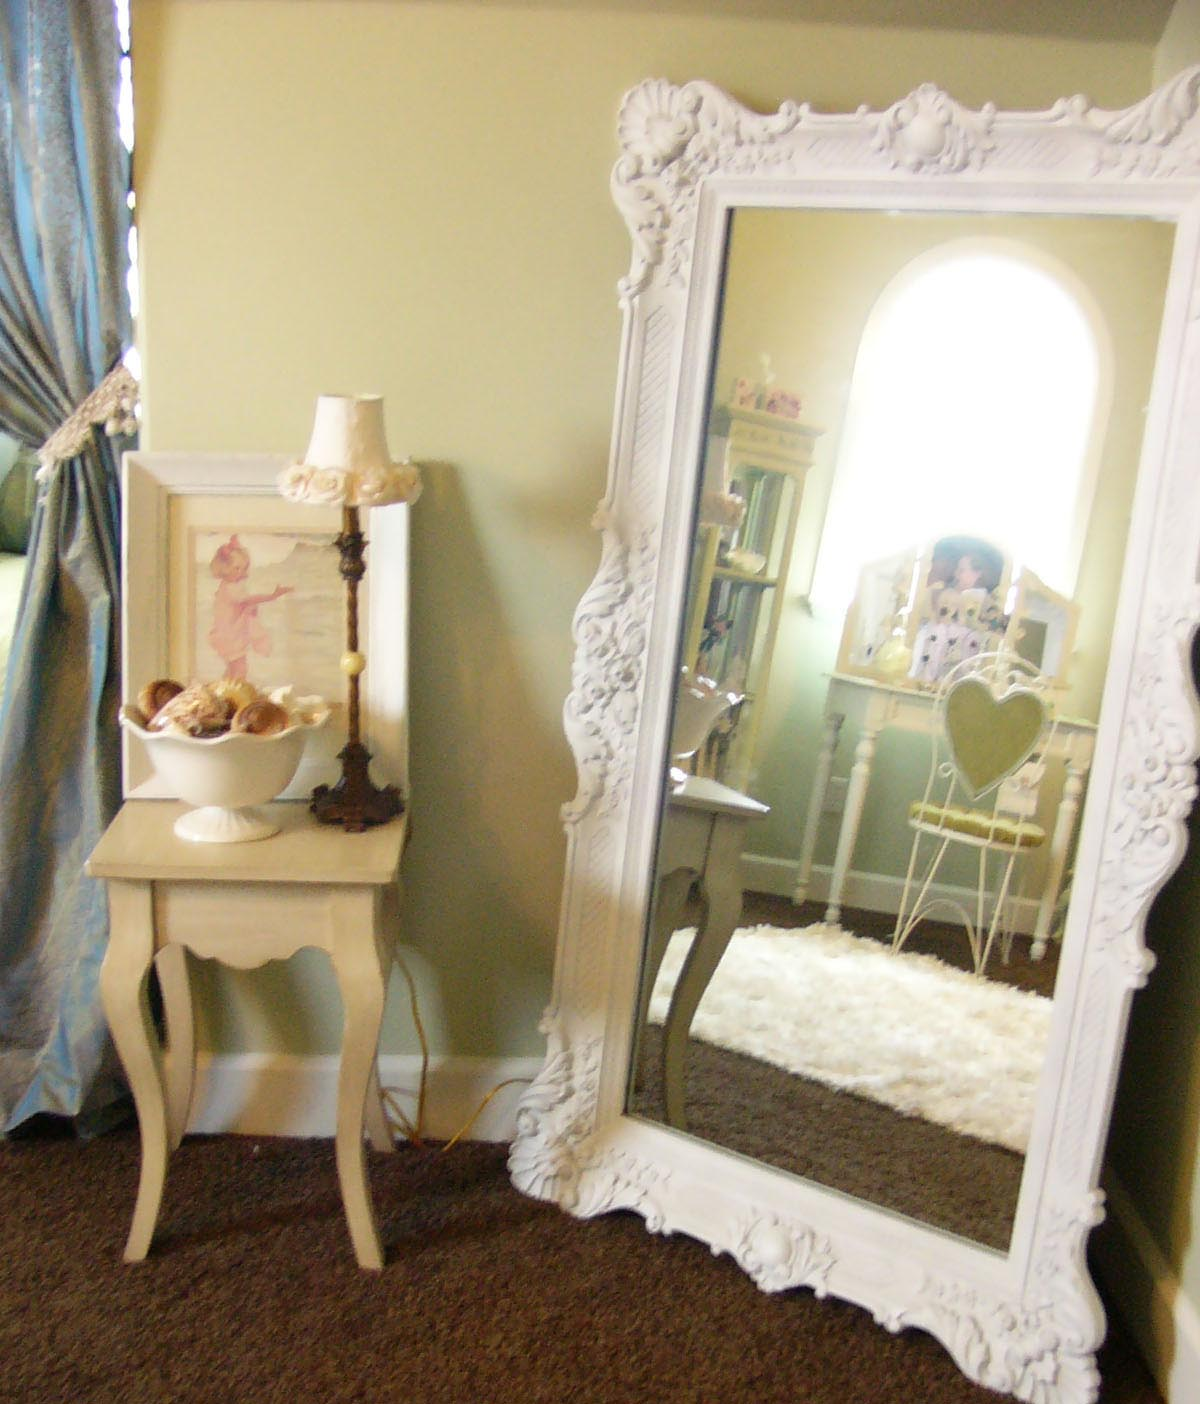 Oversized decorative wall mirrors best decor things for Oversized decorative wall mirrors